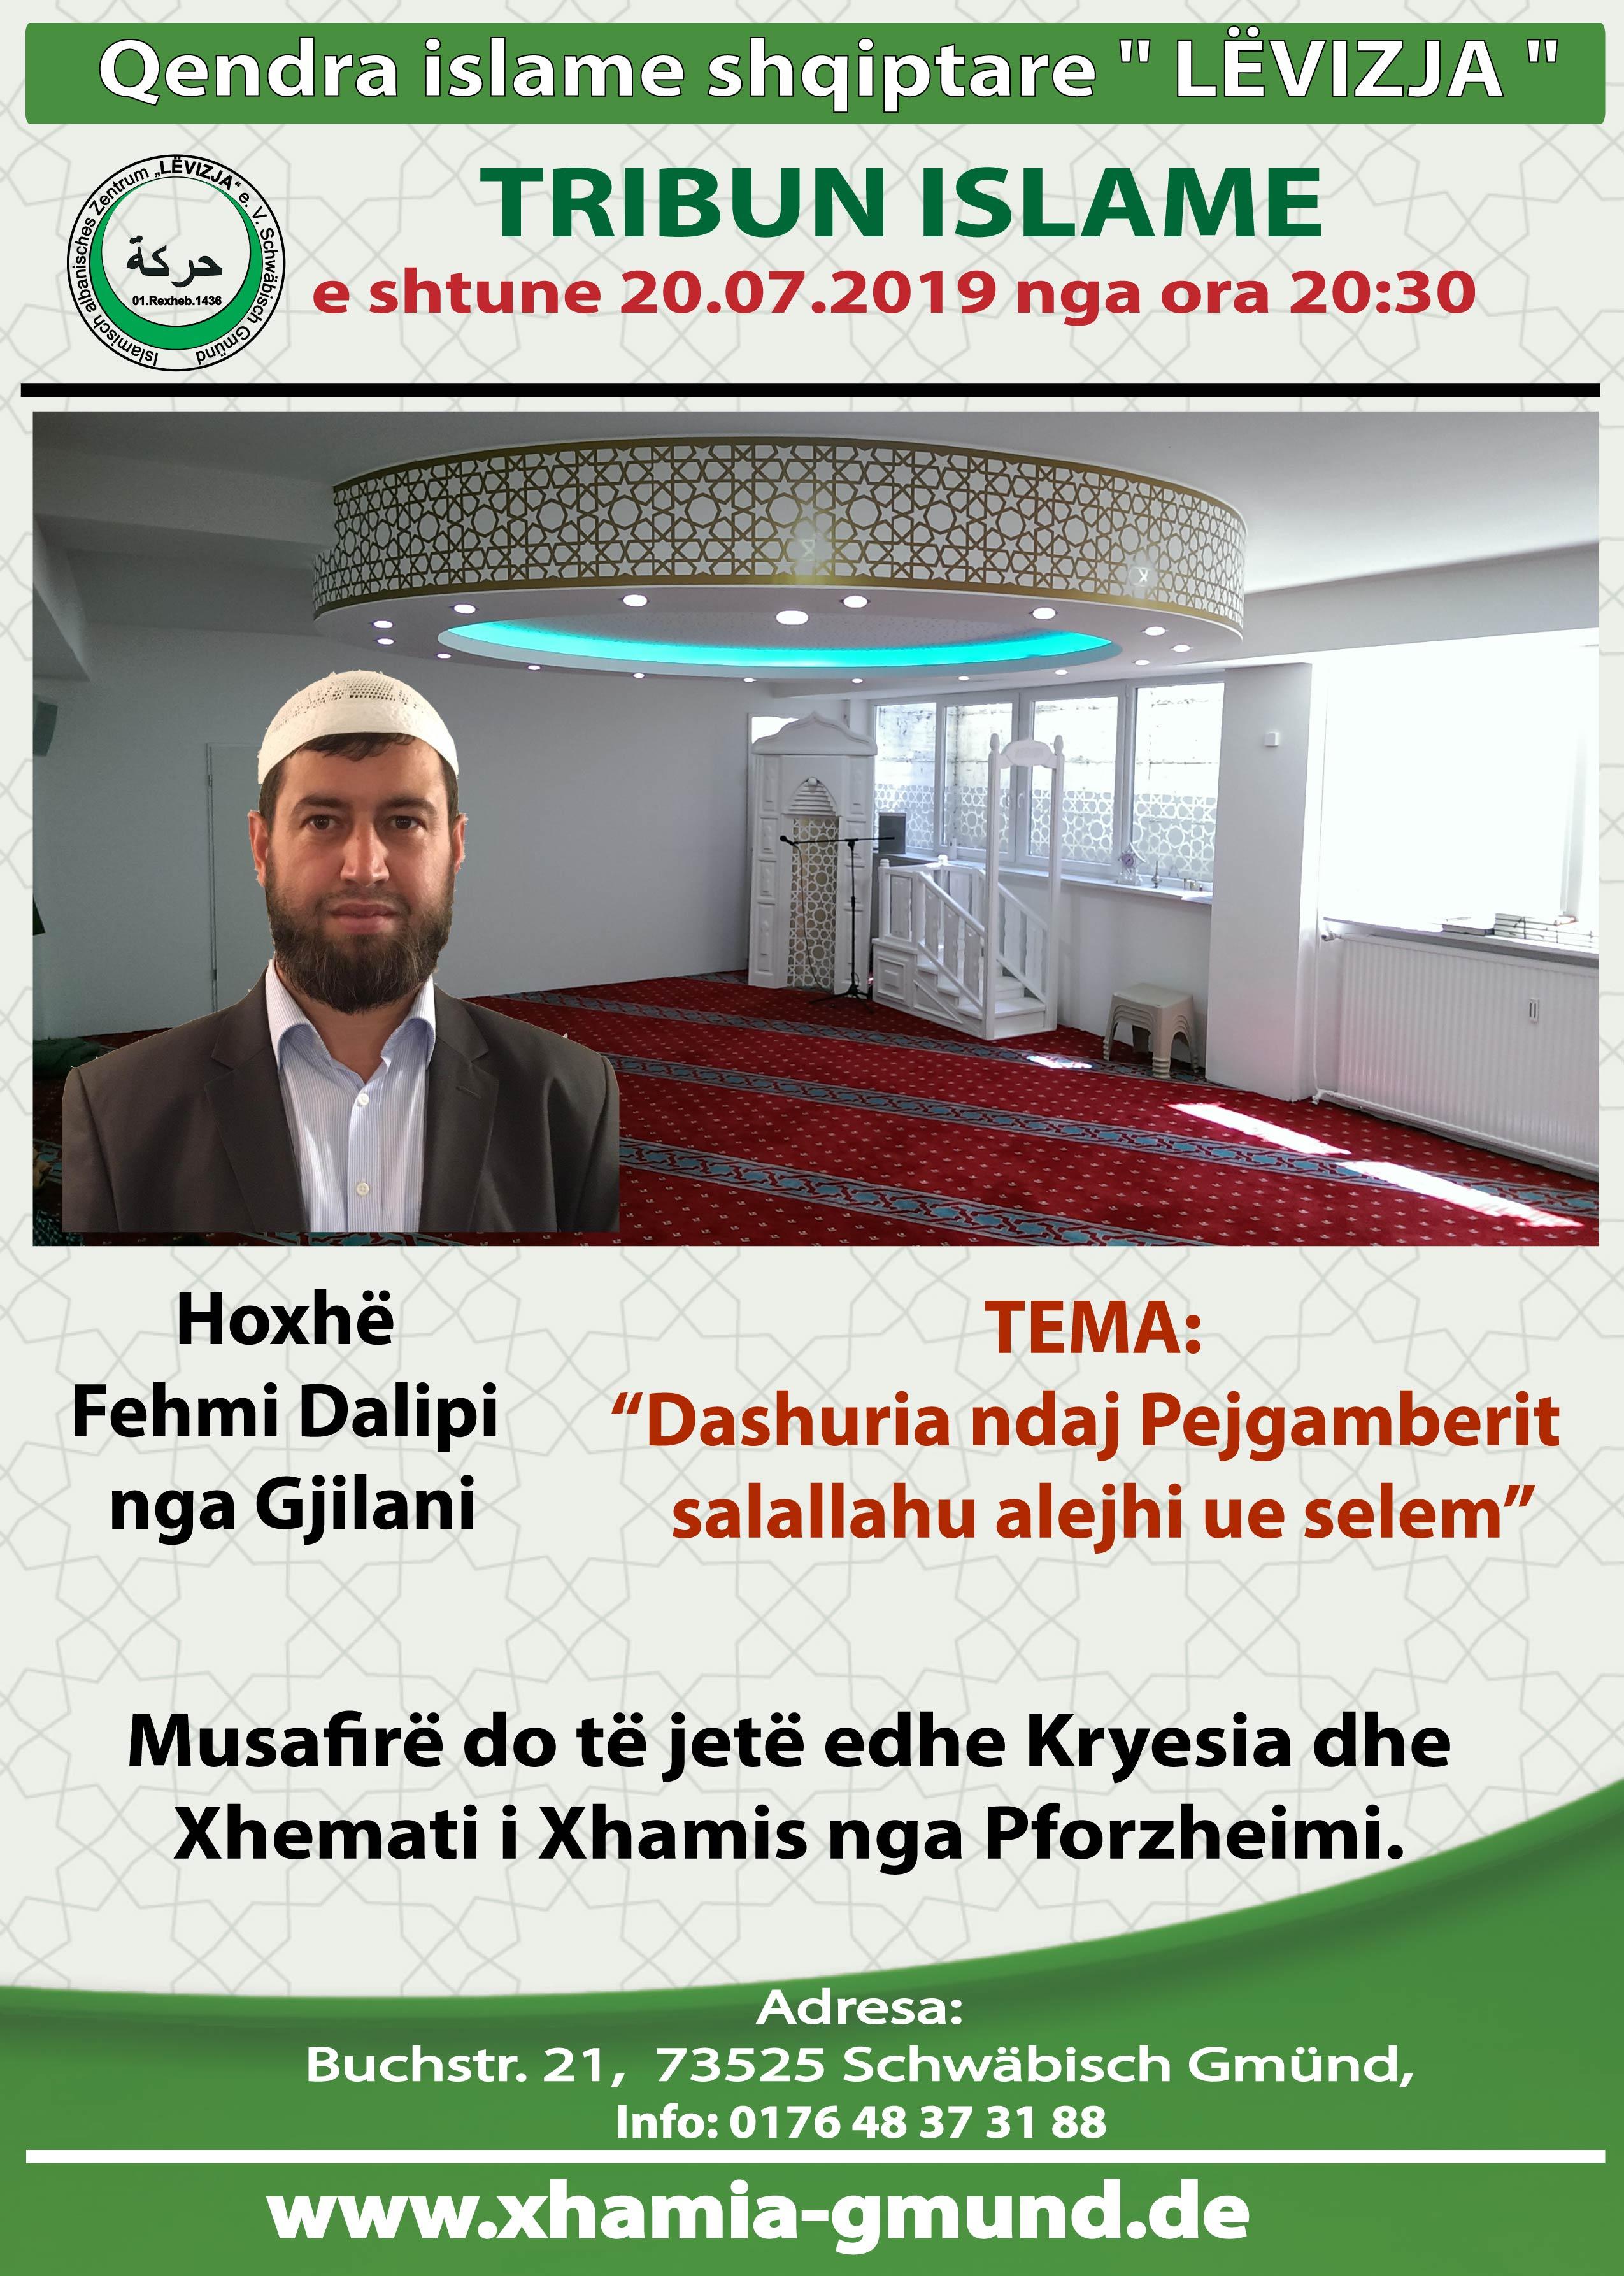 Tribun meFehmi Dalipi 20.07.2019.